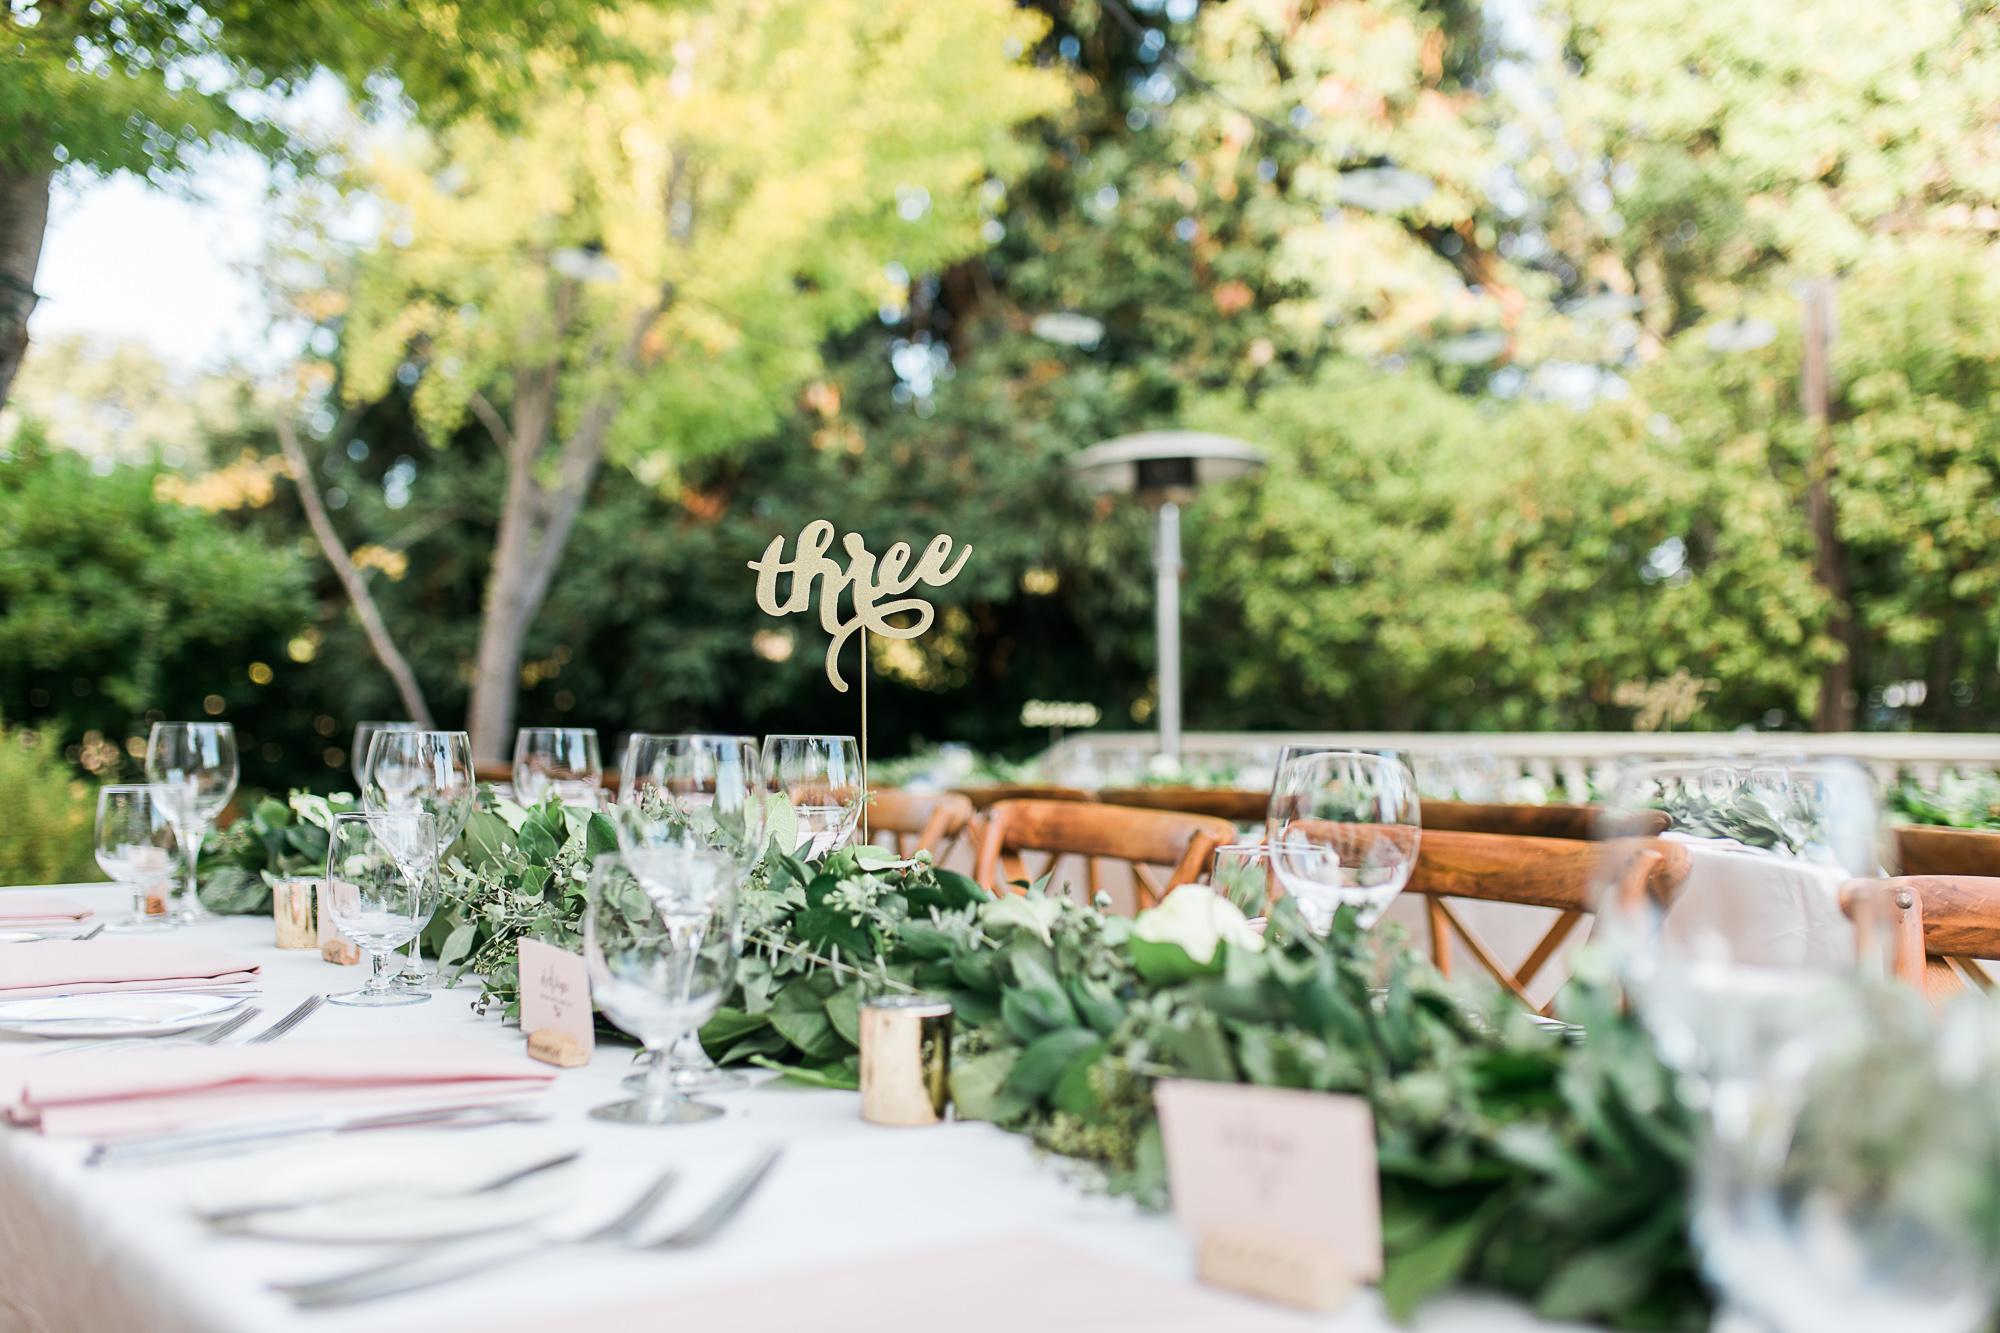 Generals Daughter Wedding Photos by JBJ Pictures - Ramekins Wedding Venue Photographer in Sonoma, Napa (25).jpg